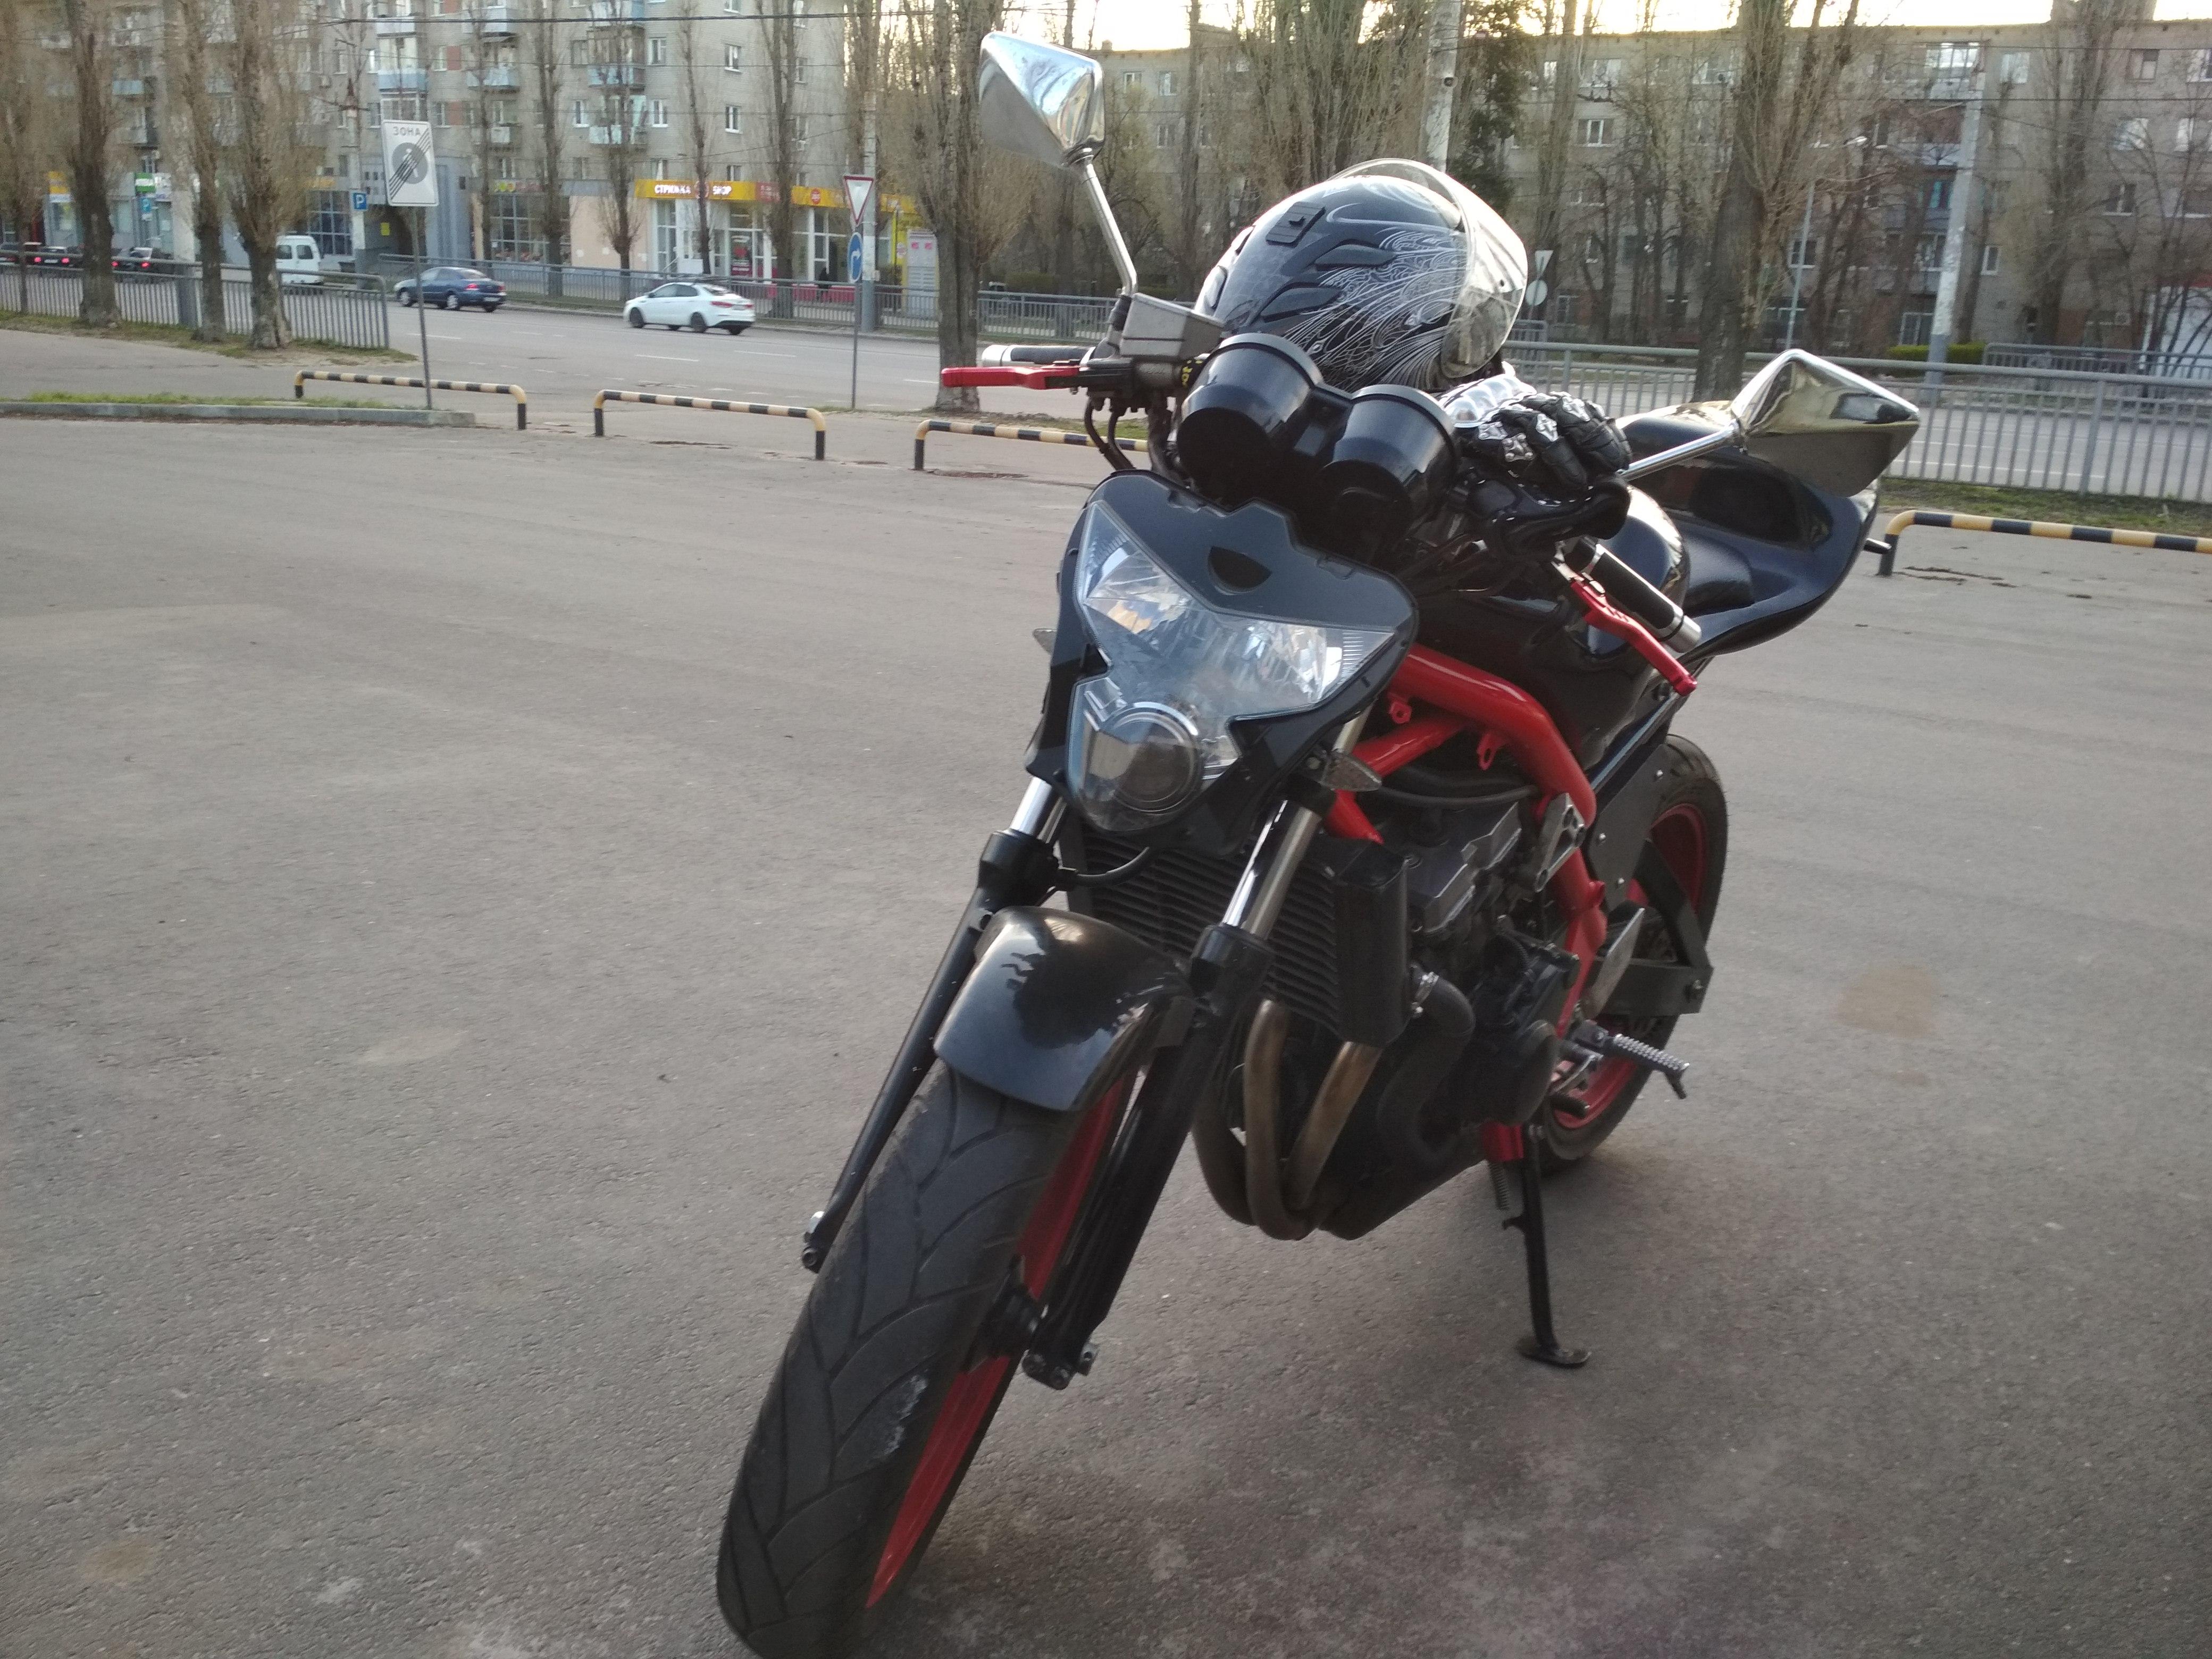 http://cb-1.ru/gallery/rwx/IMG_20200411_180356.jpg